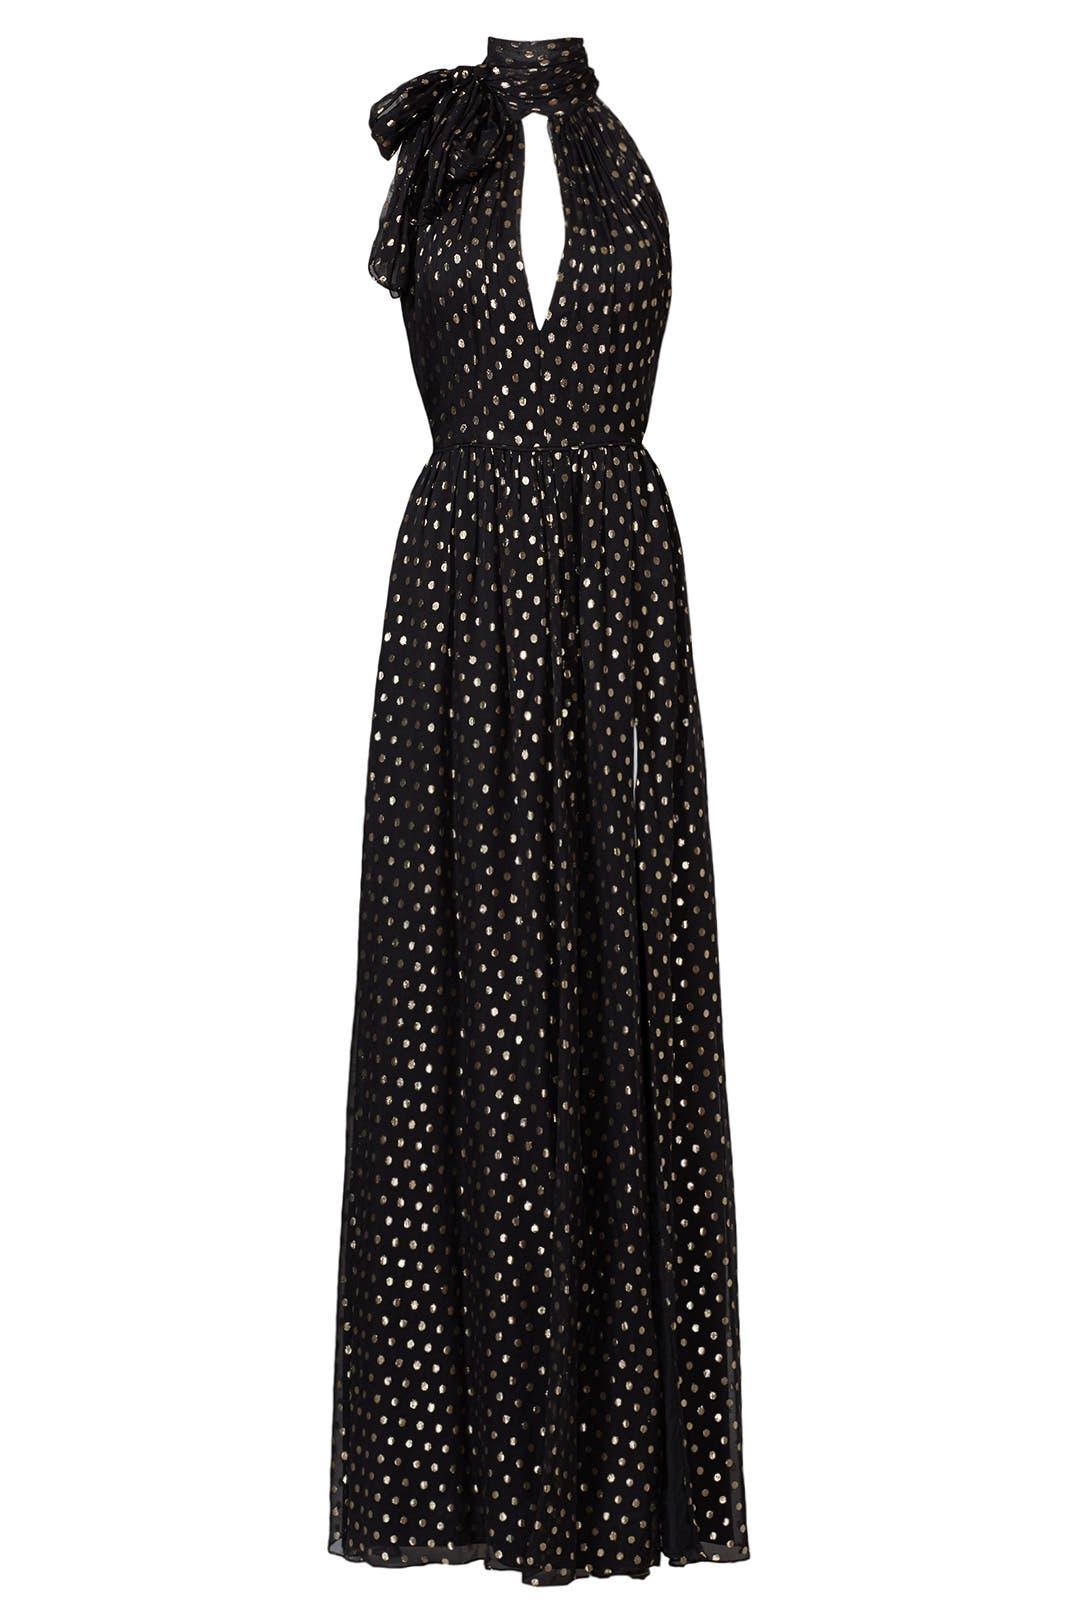 Orleans Gown by Jill Jill Stuart for $54 | Rent the Runway